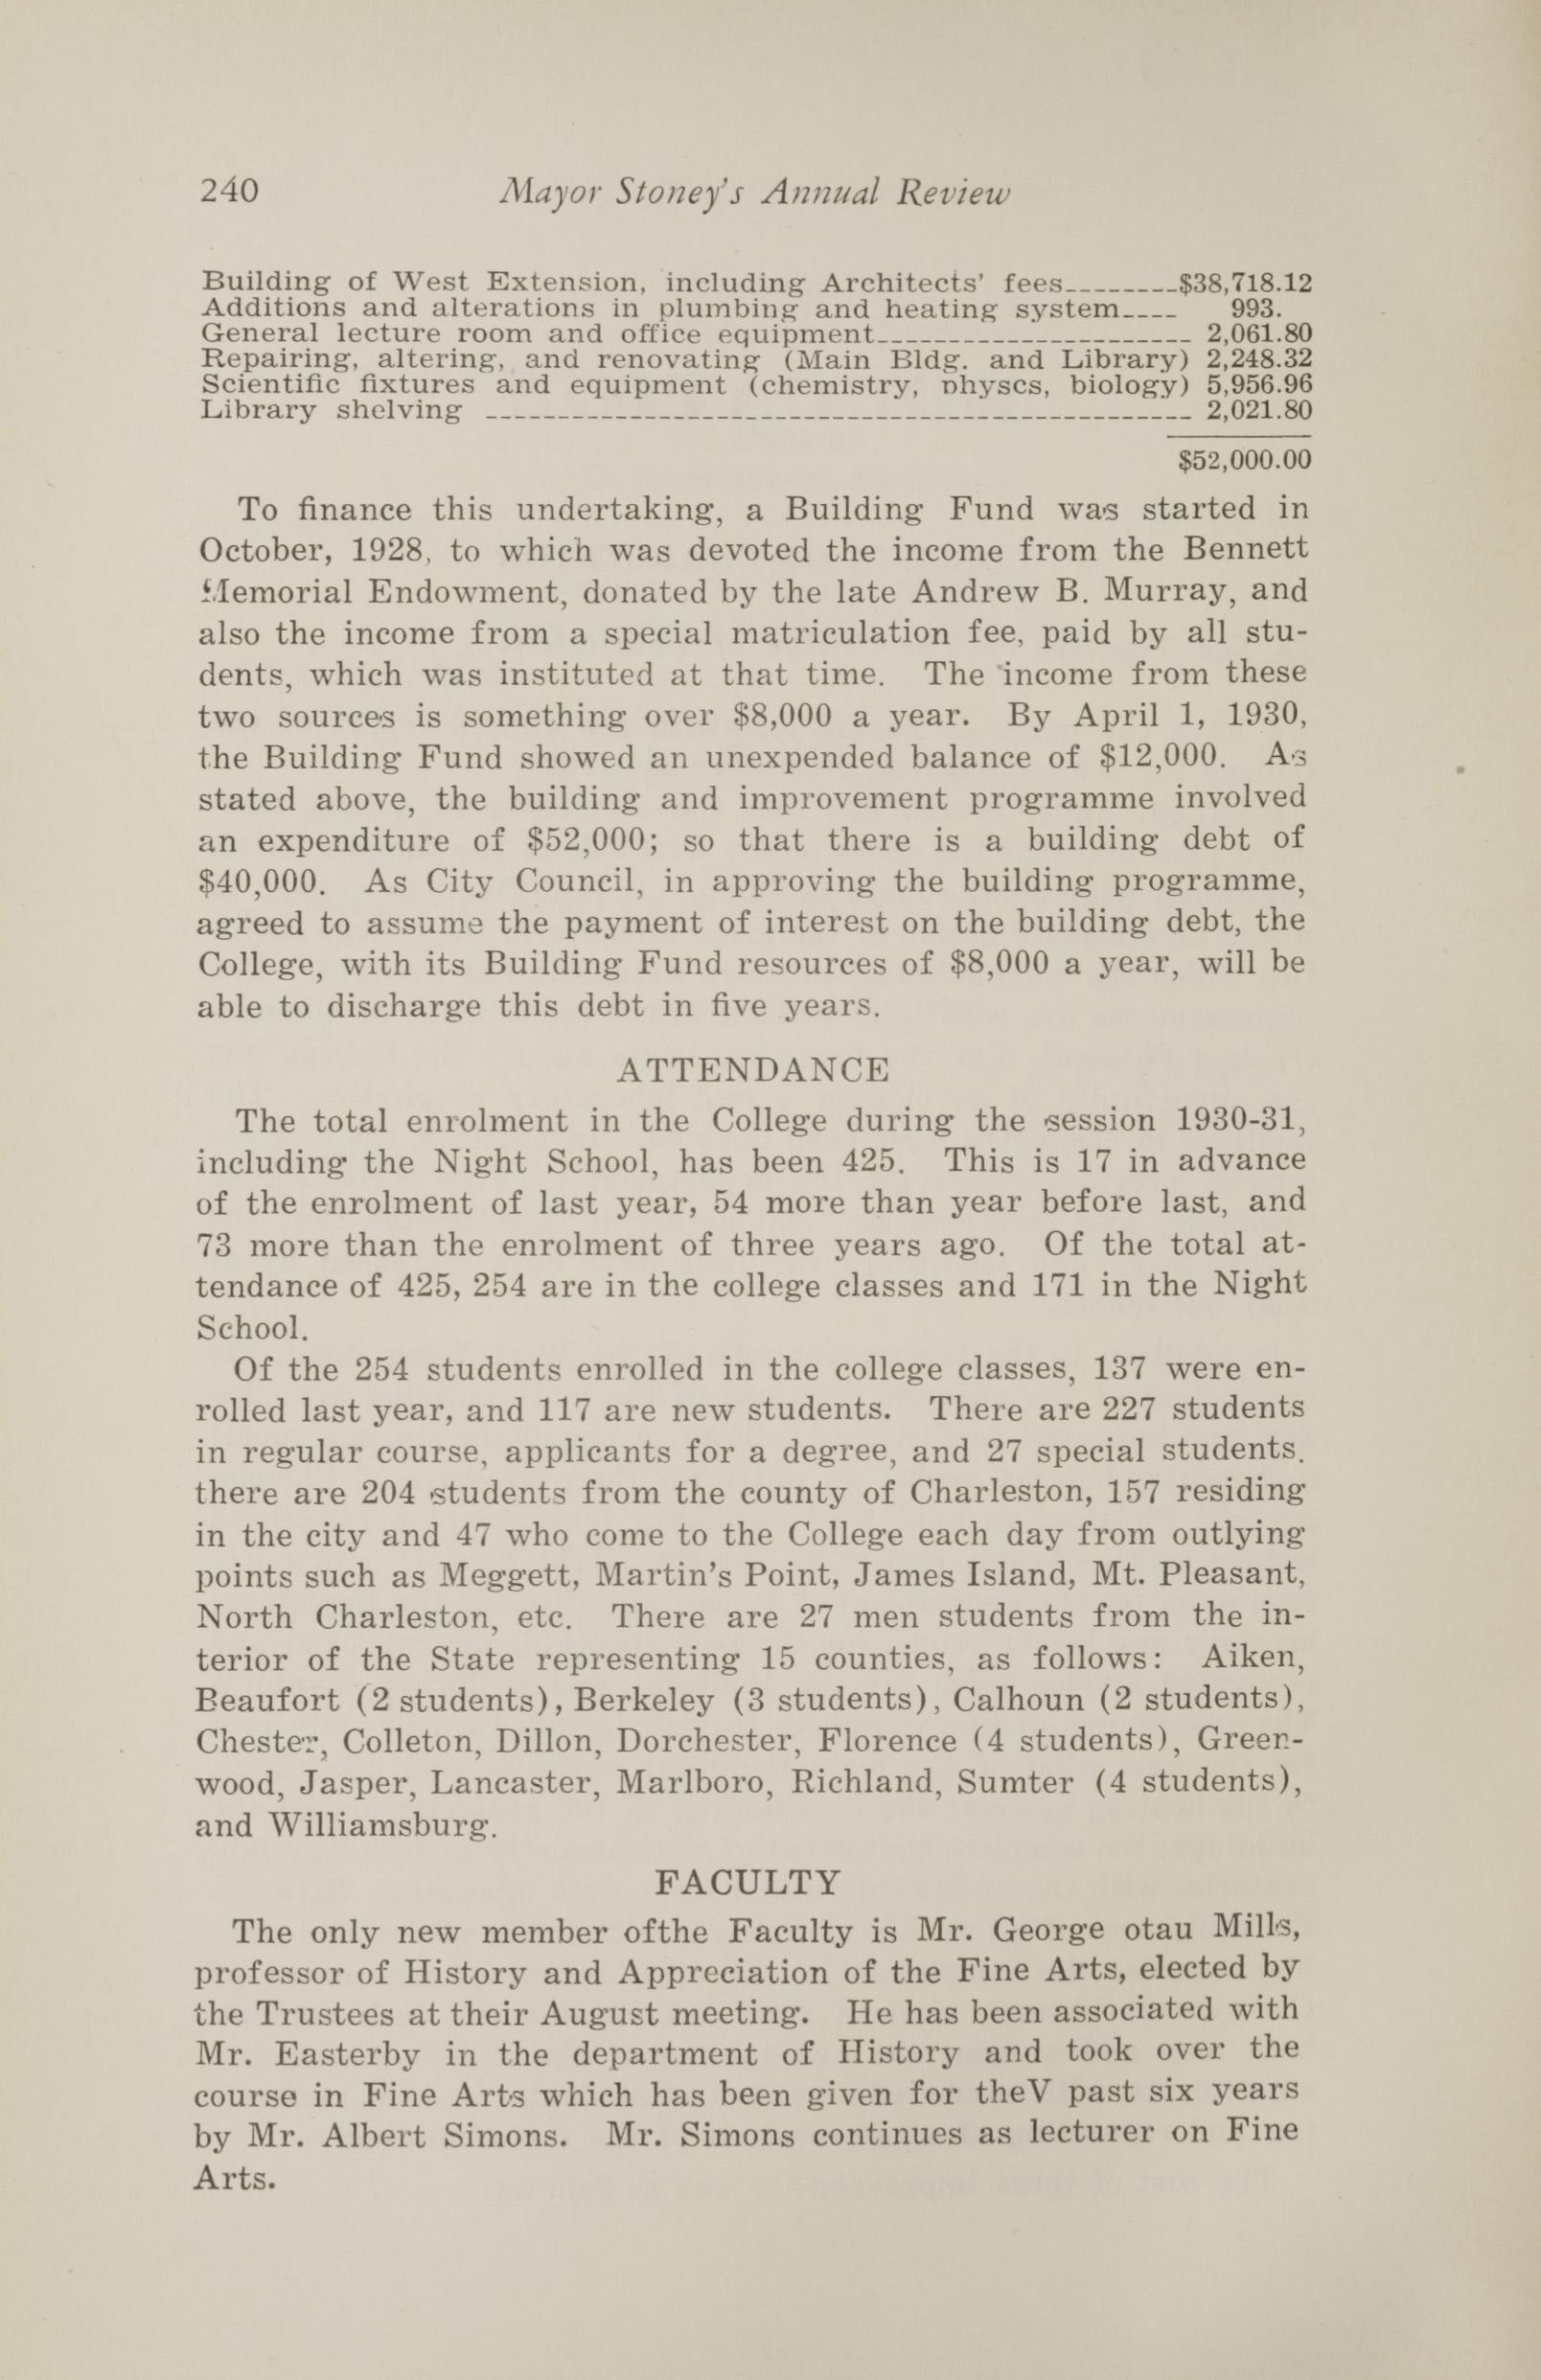 Charleston Yearbook, 1930, page 240